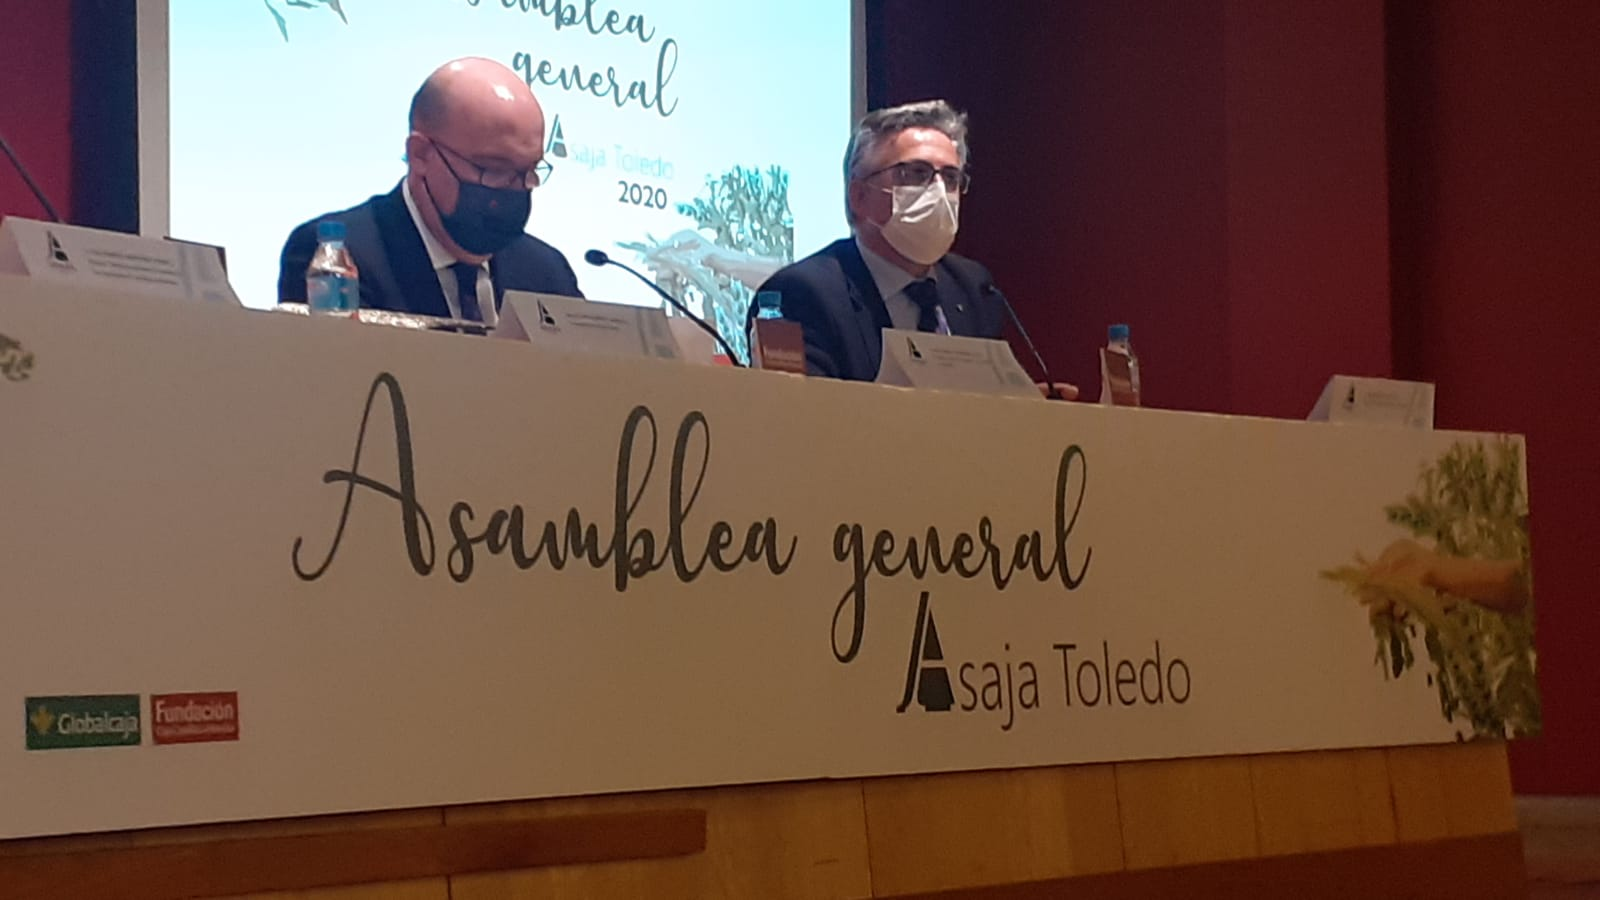 https://blog.globalcaja.es/wp-content/uploads/2020/07/asaja-toledo.jpg